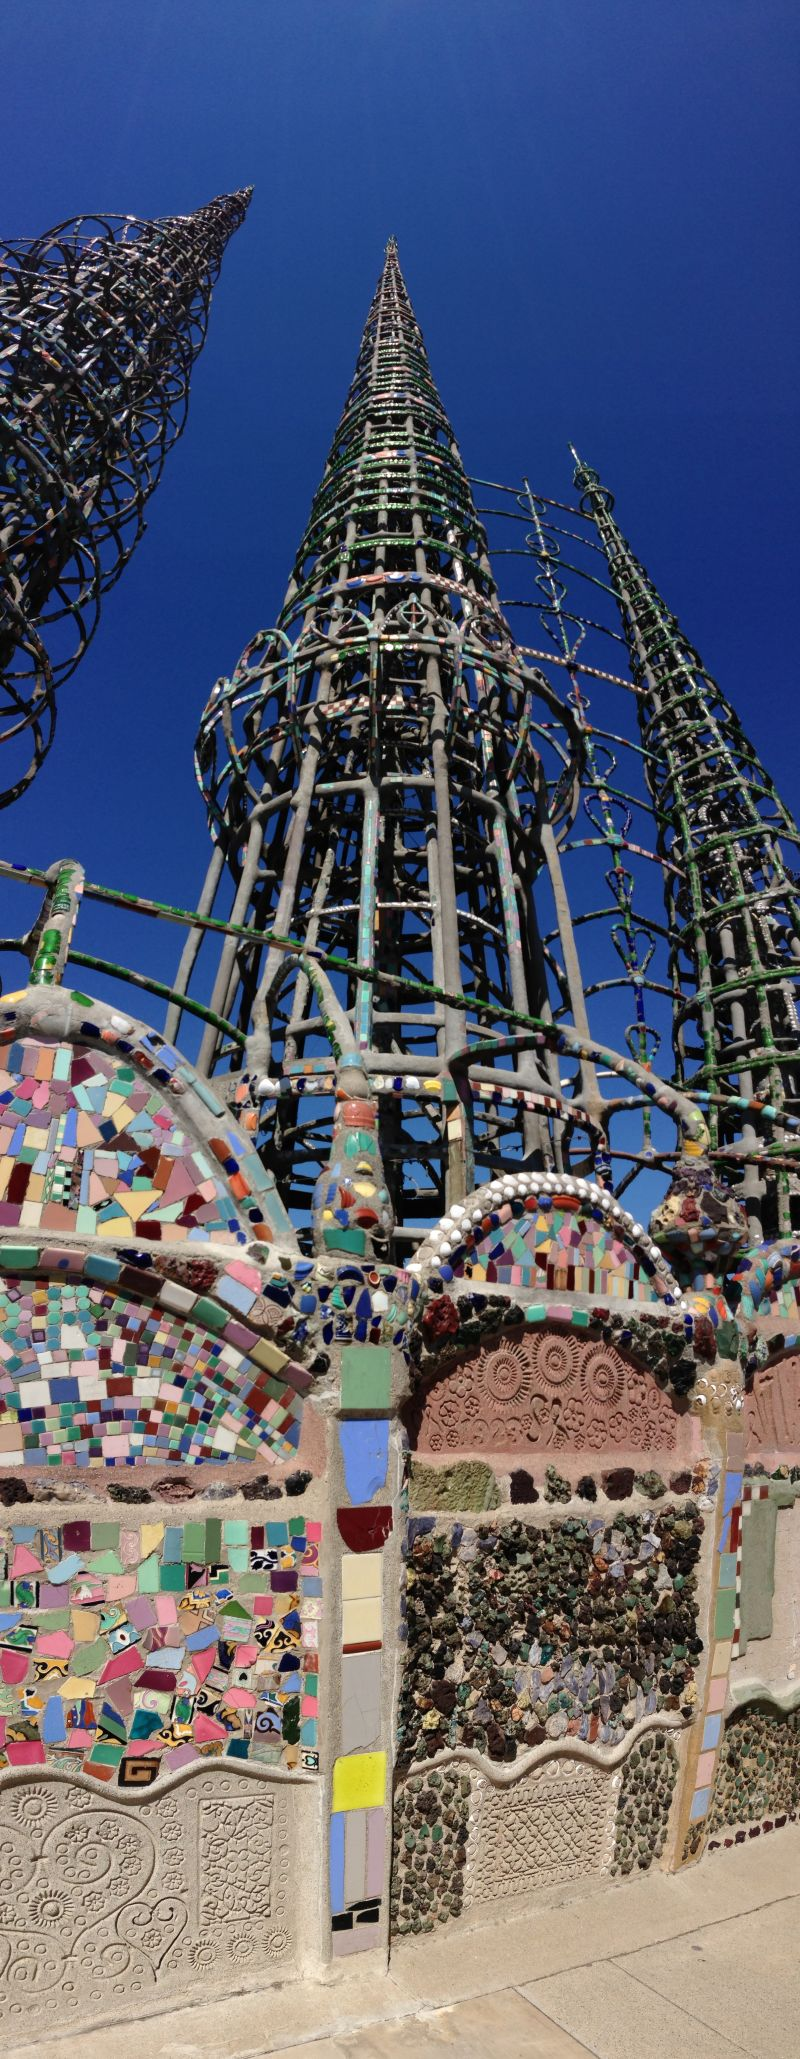 NO. 993 WATTS TOWERS OF SIMON RODIA